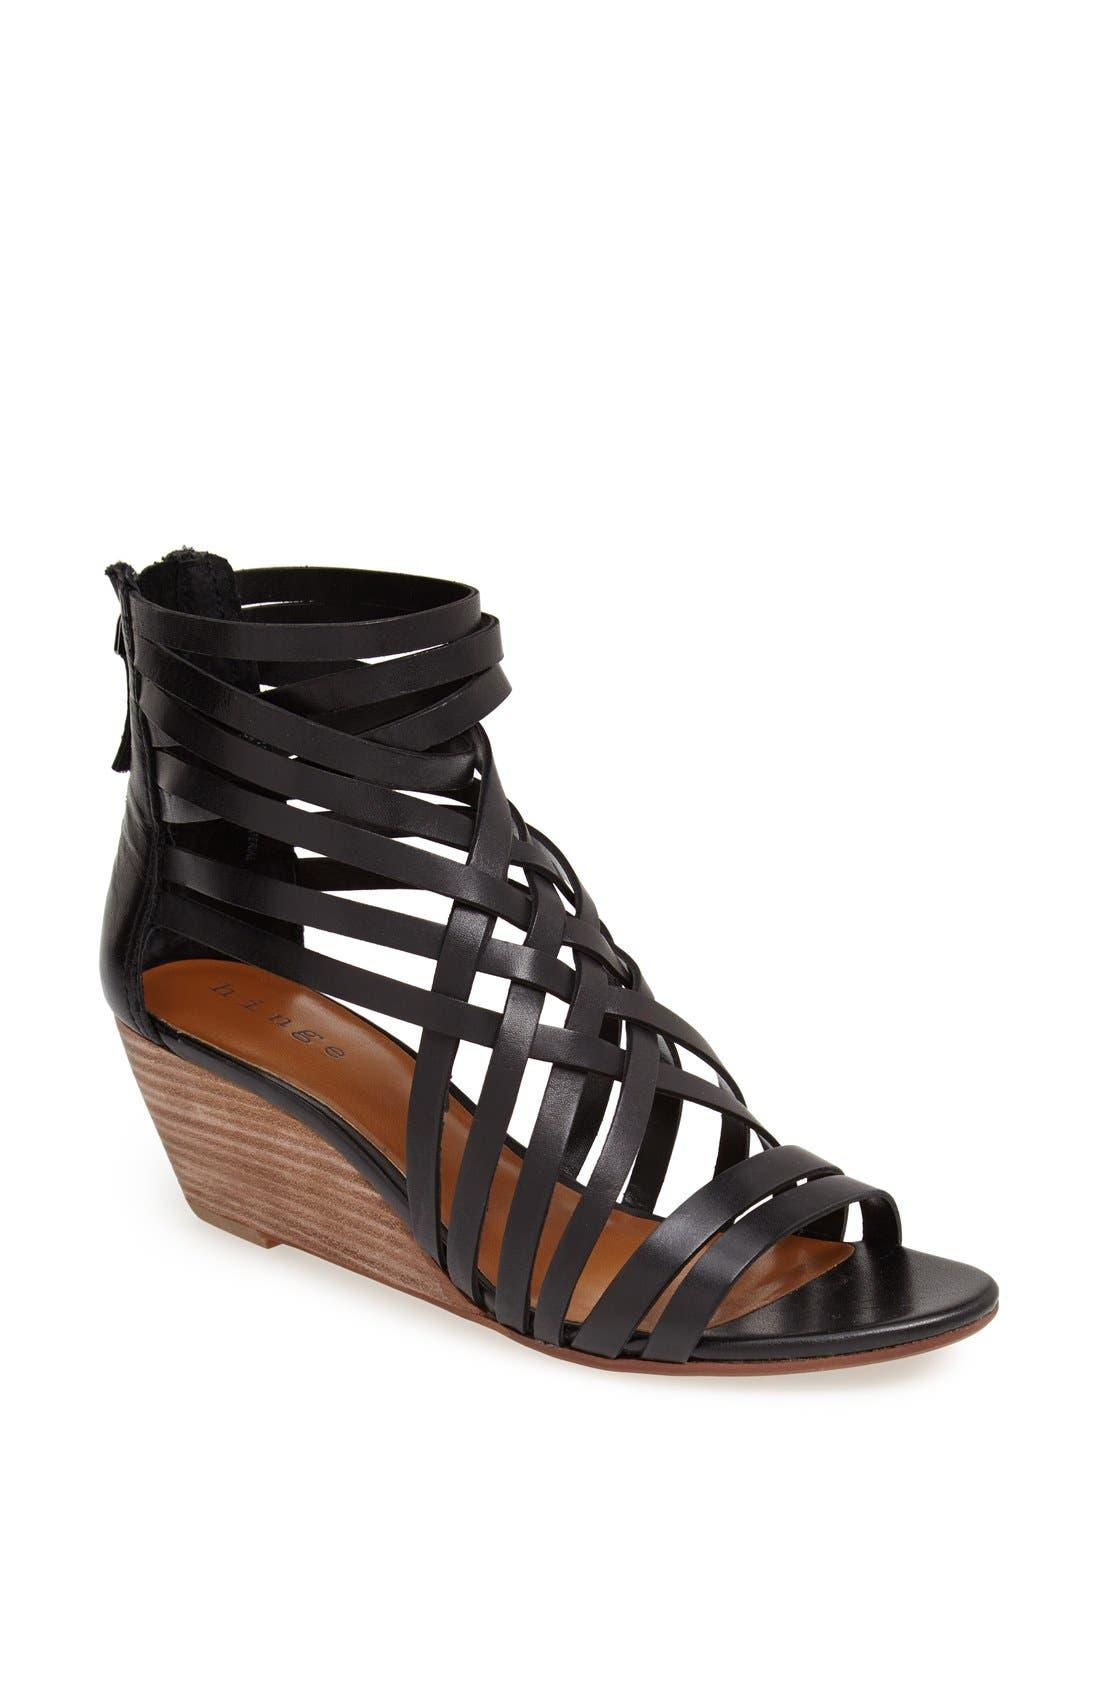 'Neta' Leather Wedge Sandal, Main, color, 001